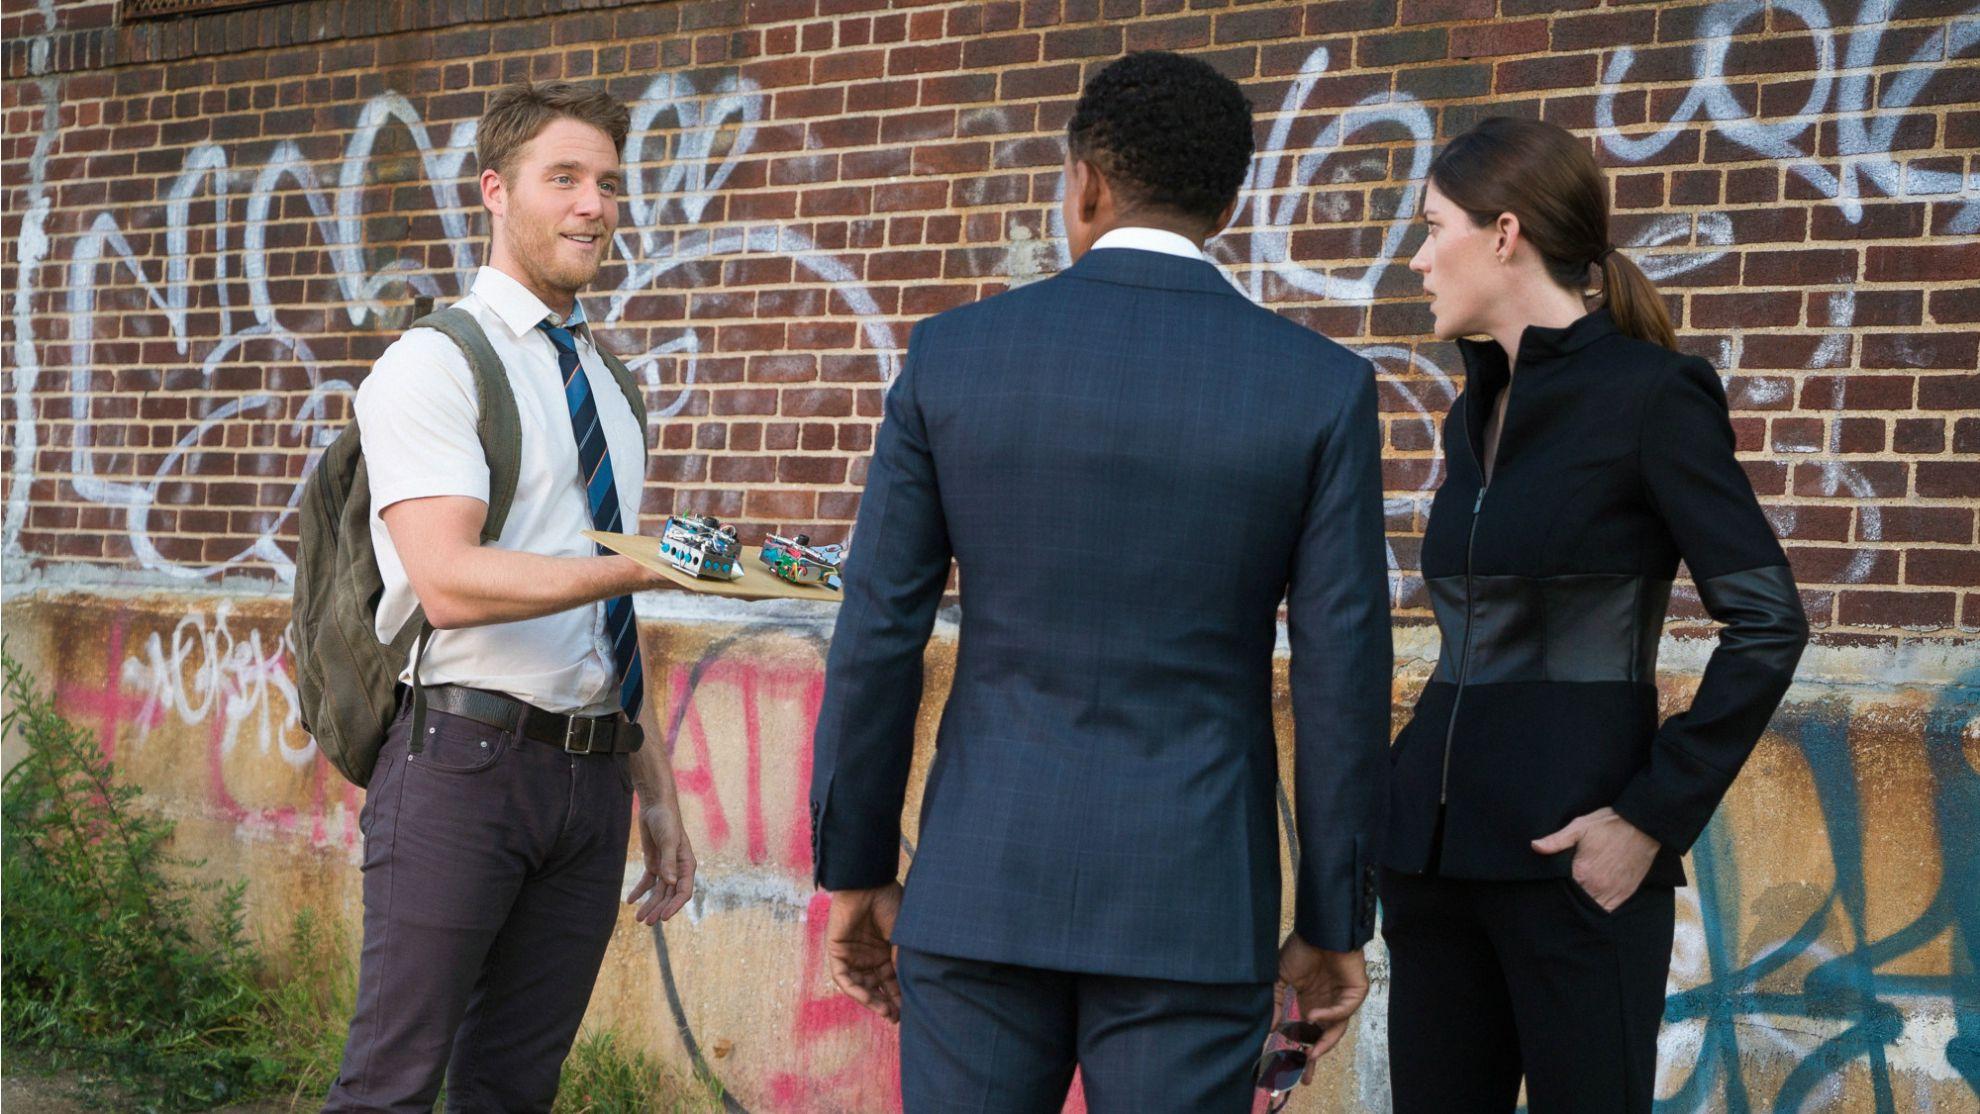 Jake McDorman as Brian Finch, Hill Harper as Agent Boyle, and Jennifer Carpenter as Agent Harris